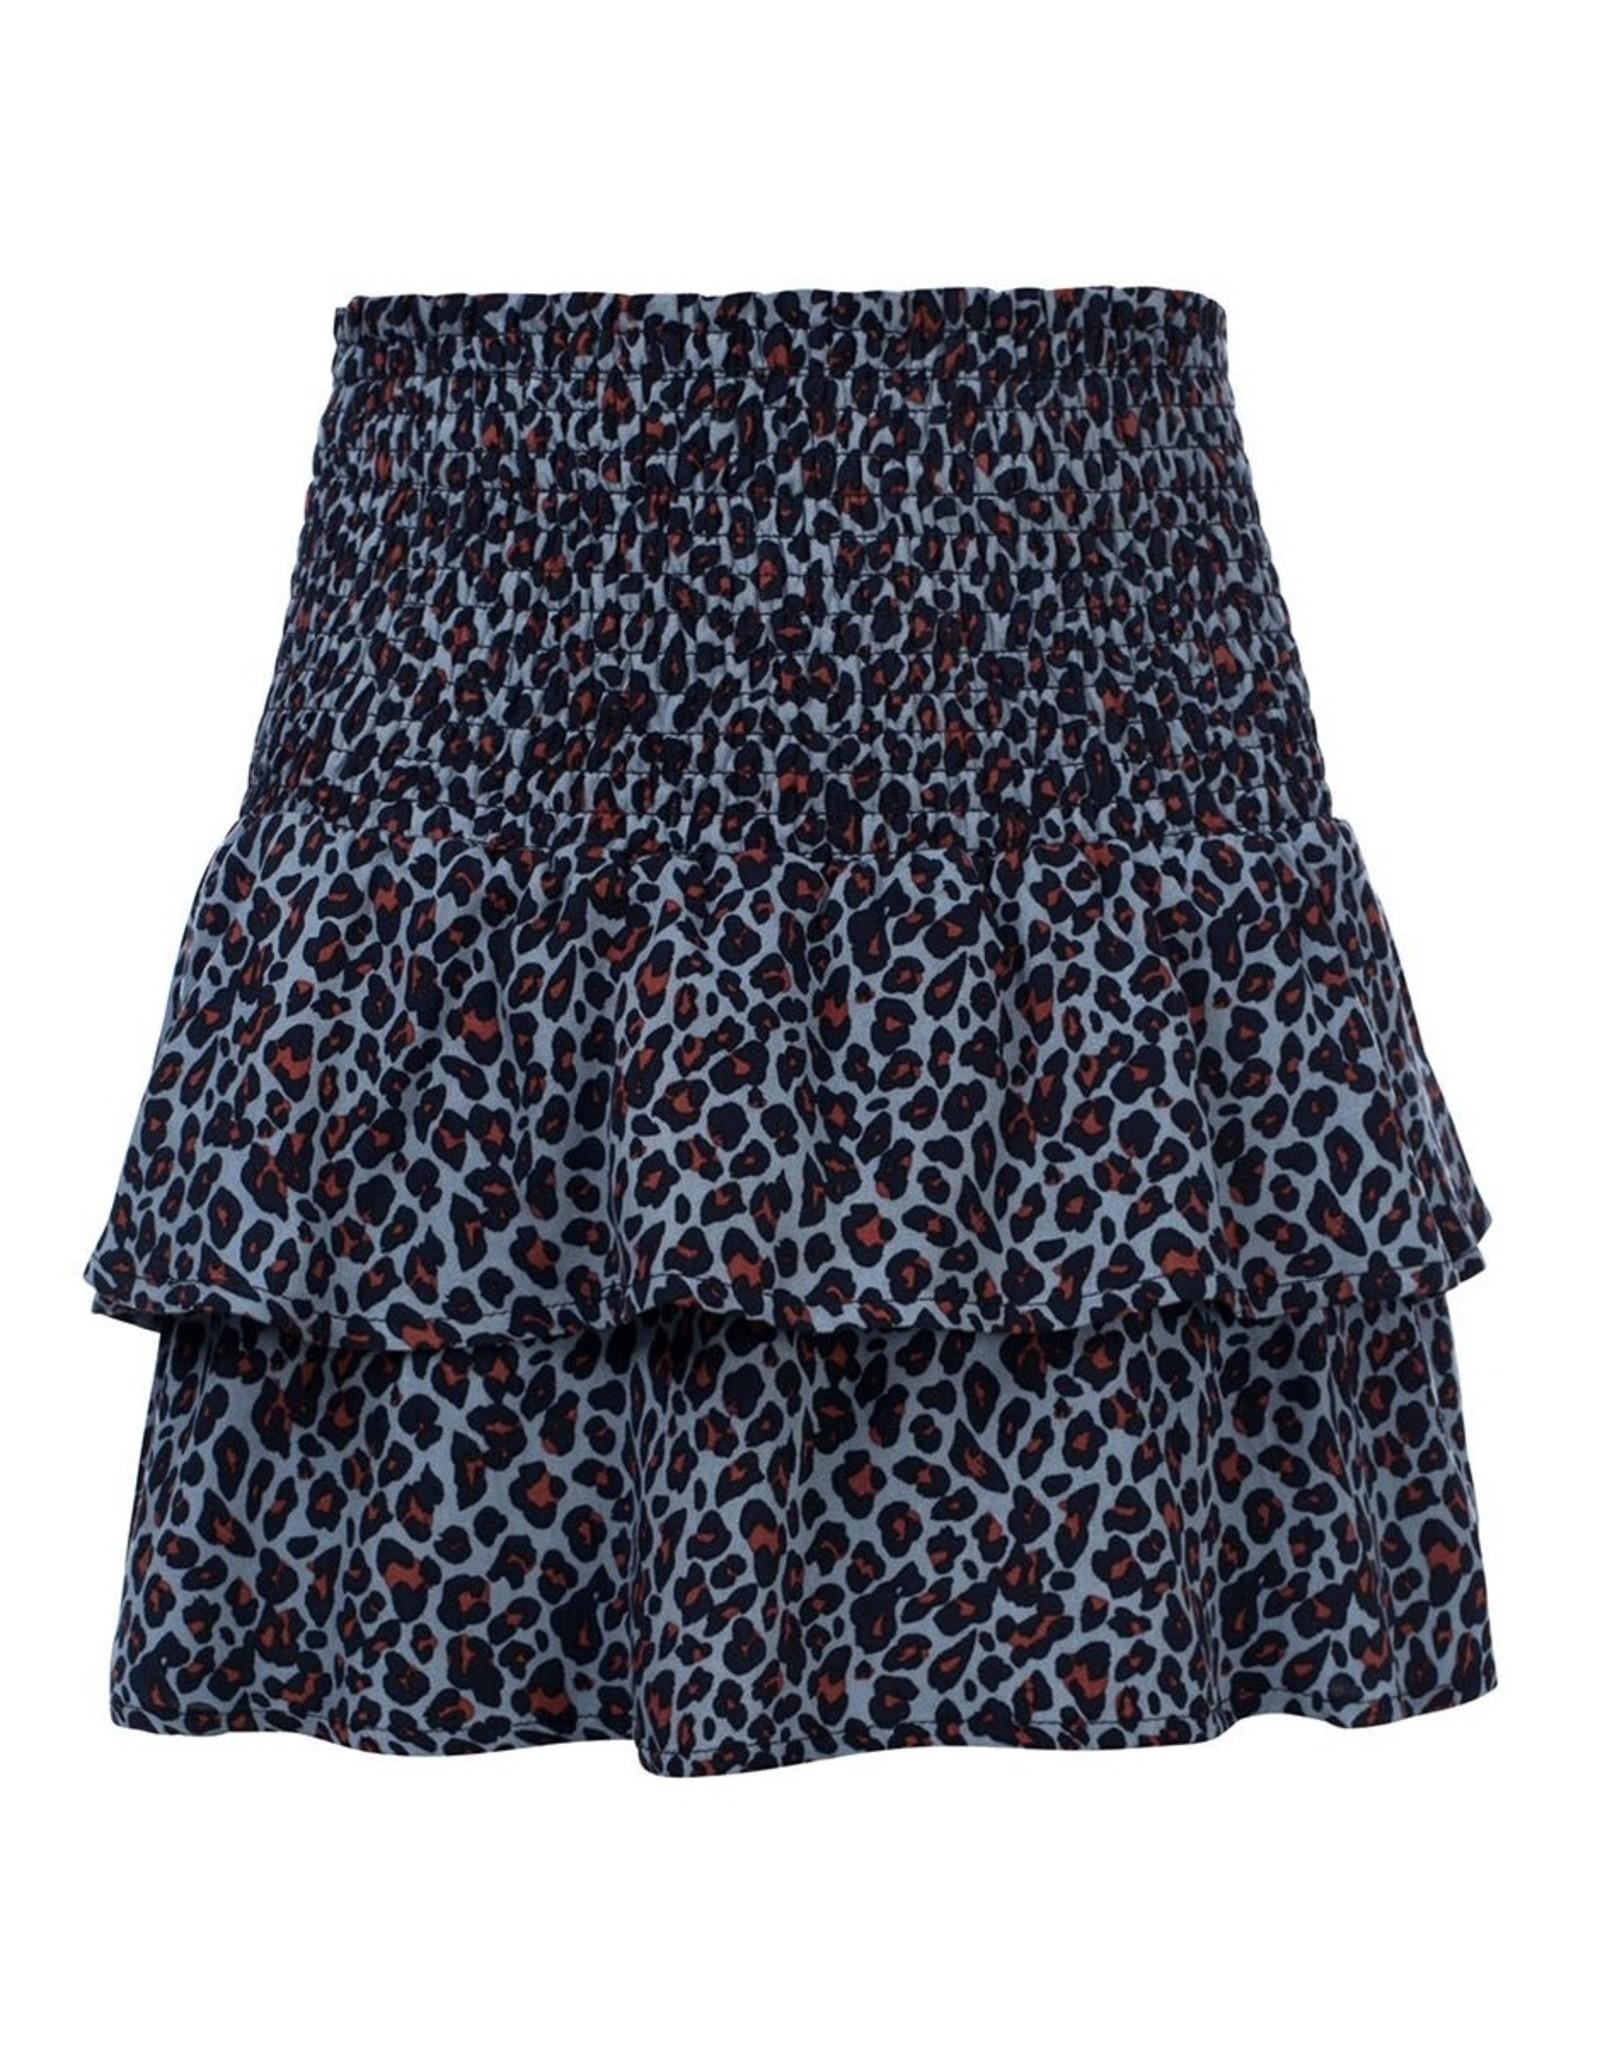 looxs 2132-5753 Skirt